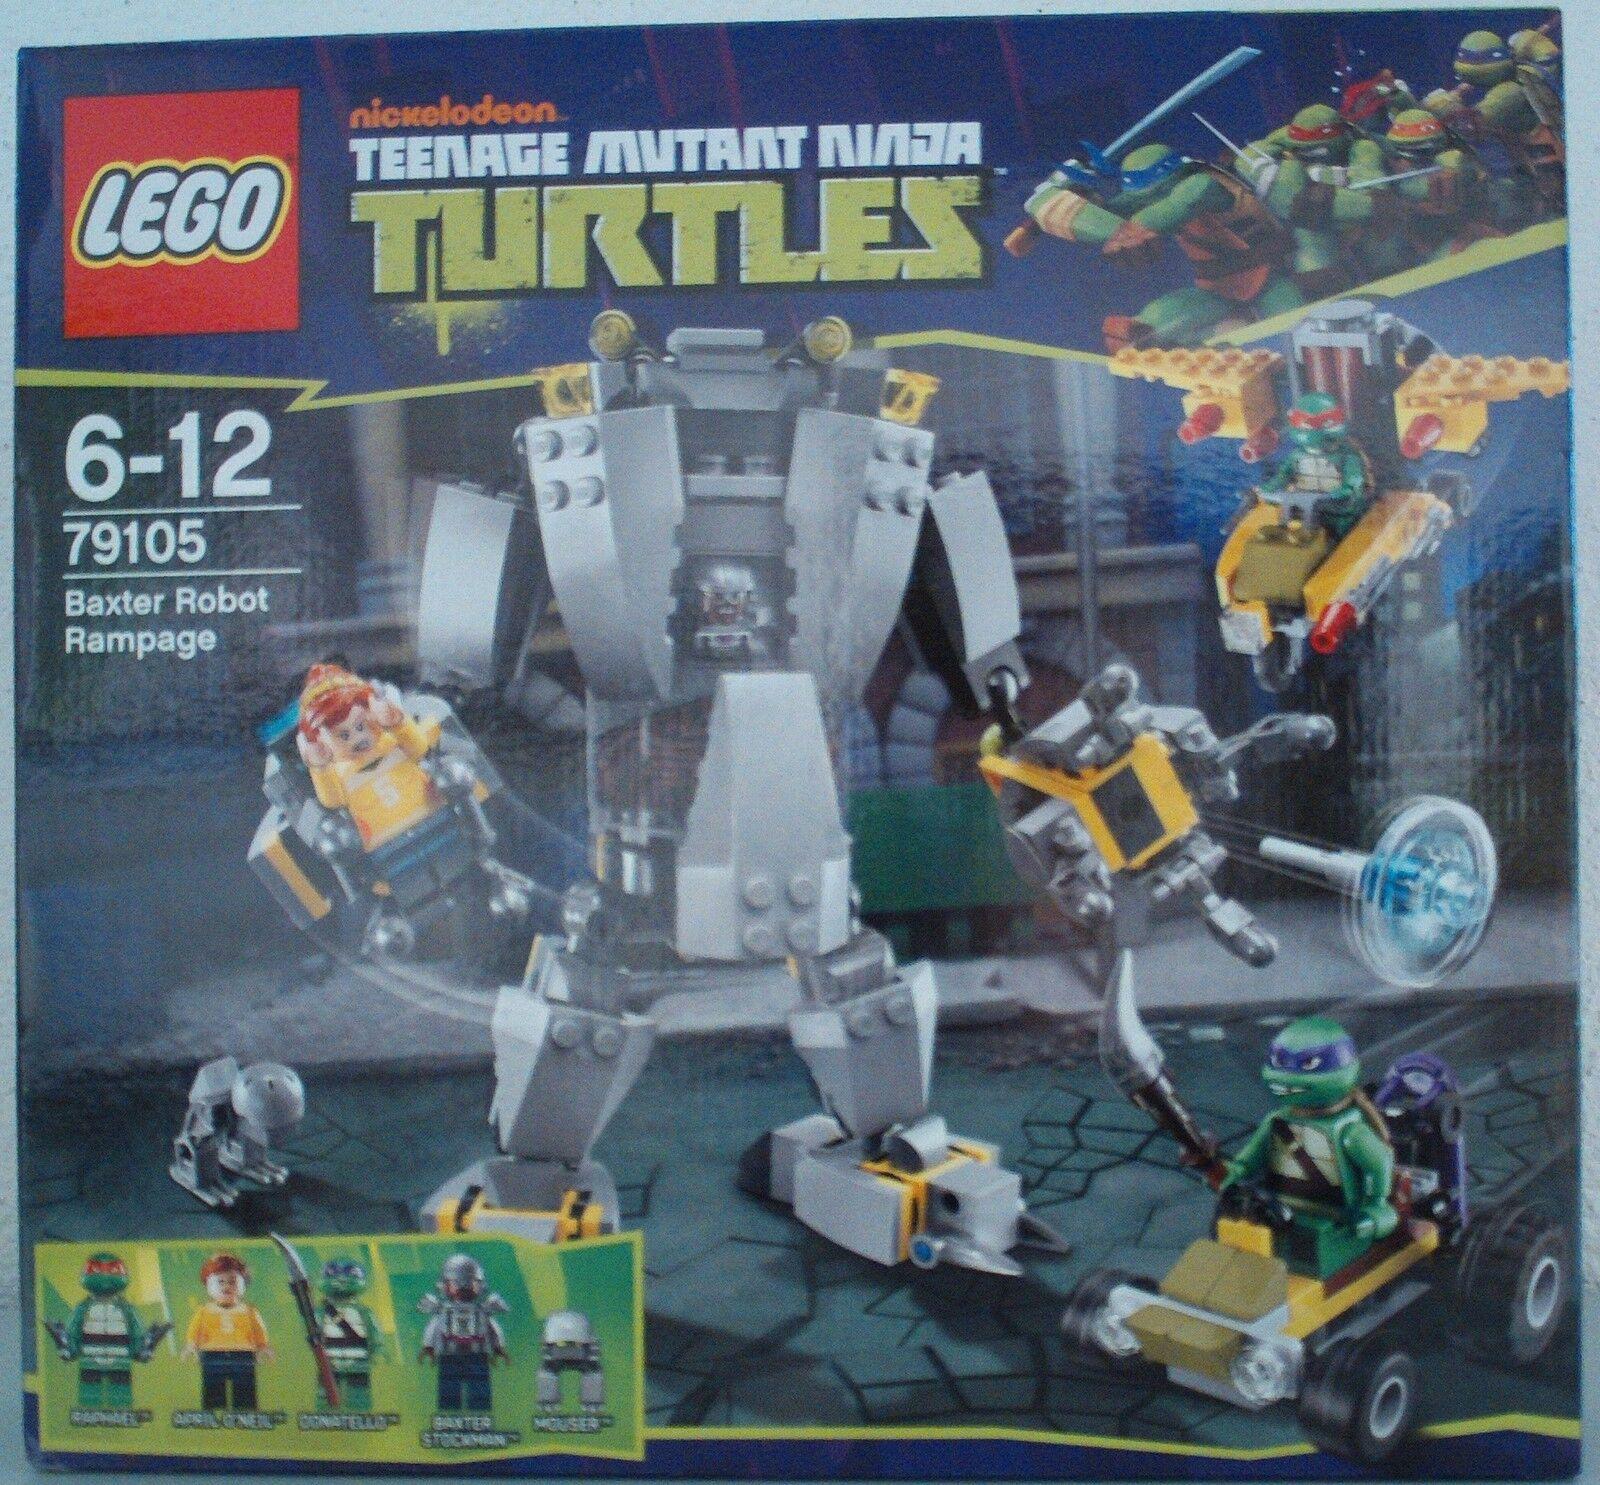 NEU LEGO® Turtles 79105 Baxters Roboter / Baxter Robot Rampage OVP